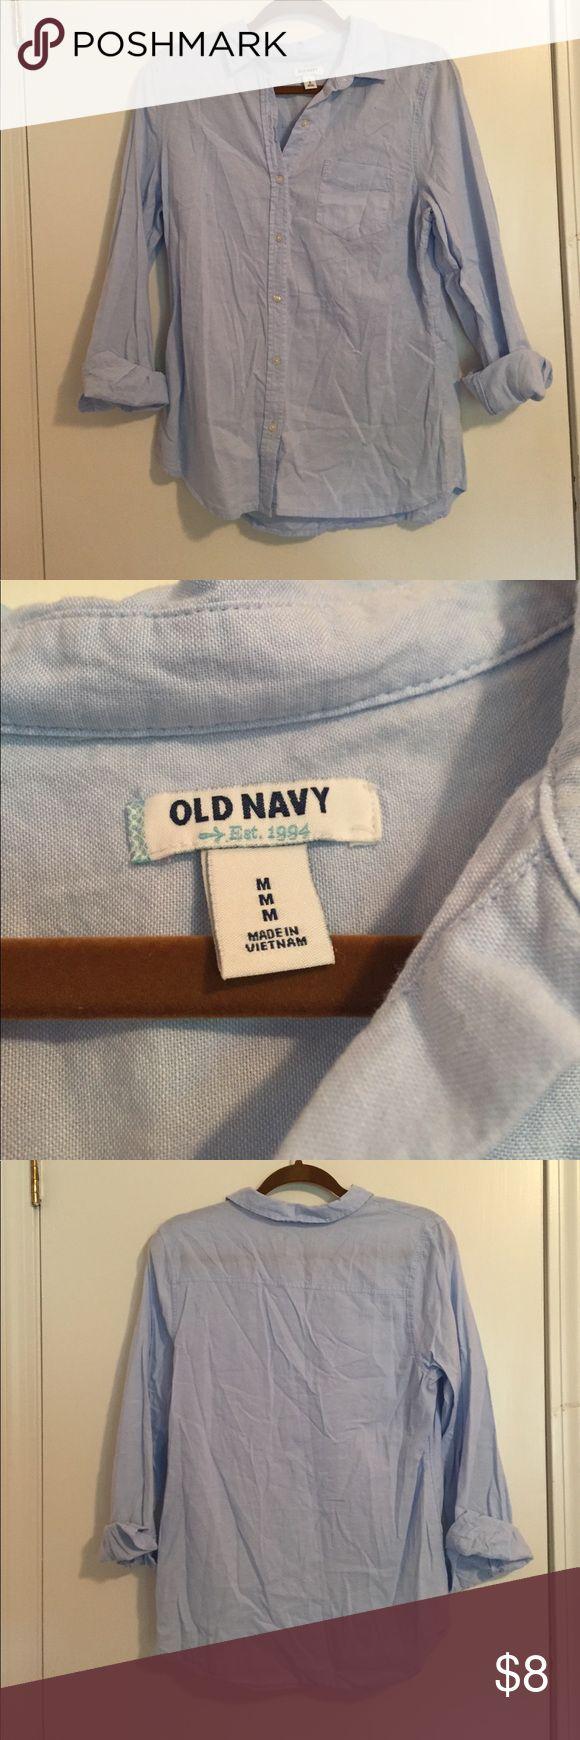 Light blue oxford shirt Light blue size M oxford shirt Old Navy Tops Button Down Shirts